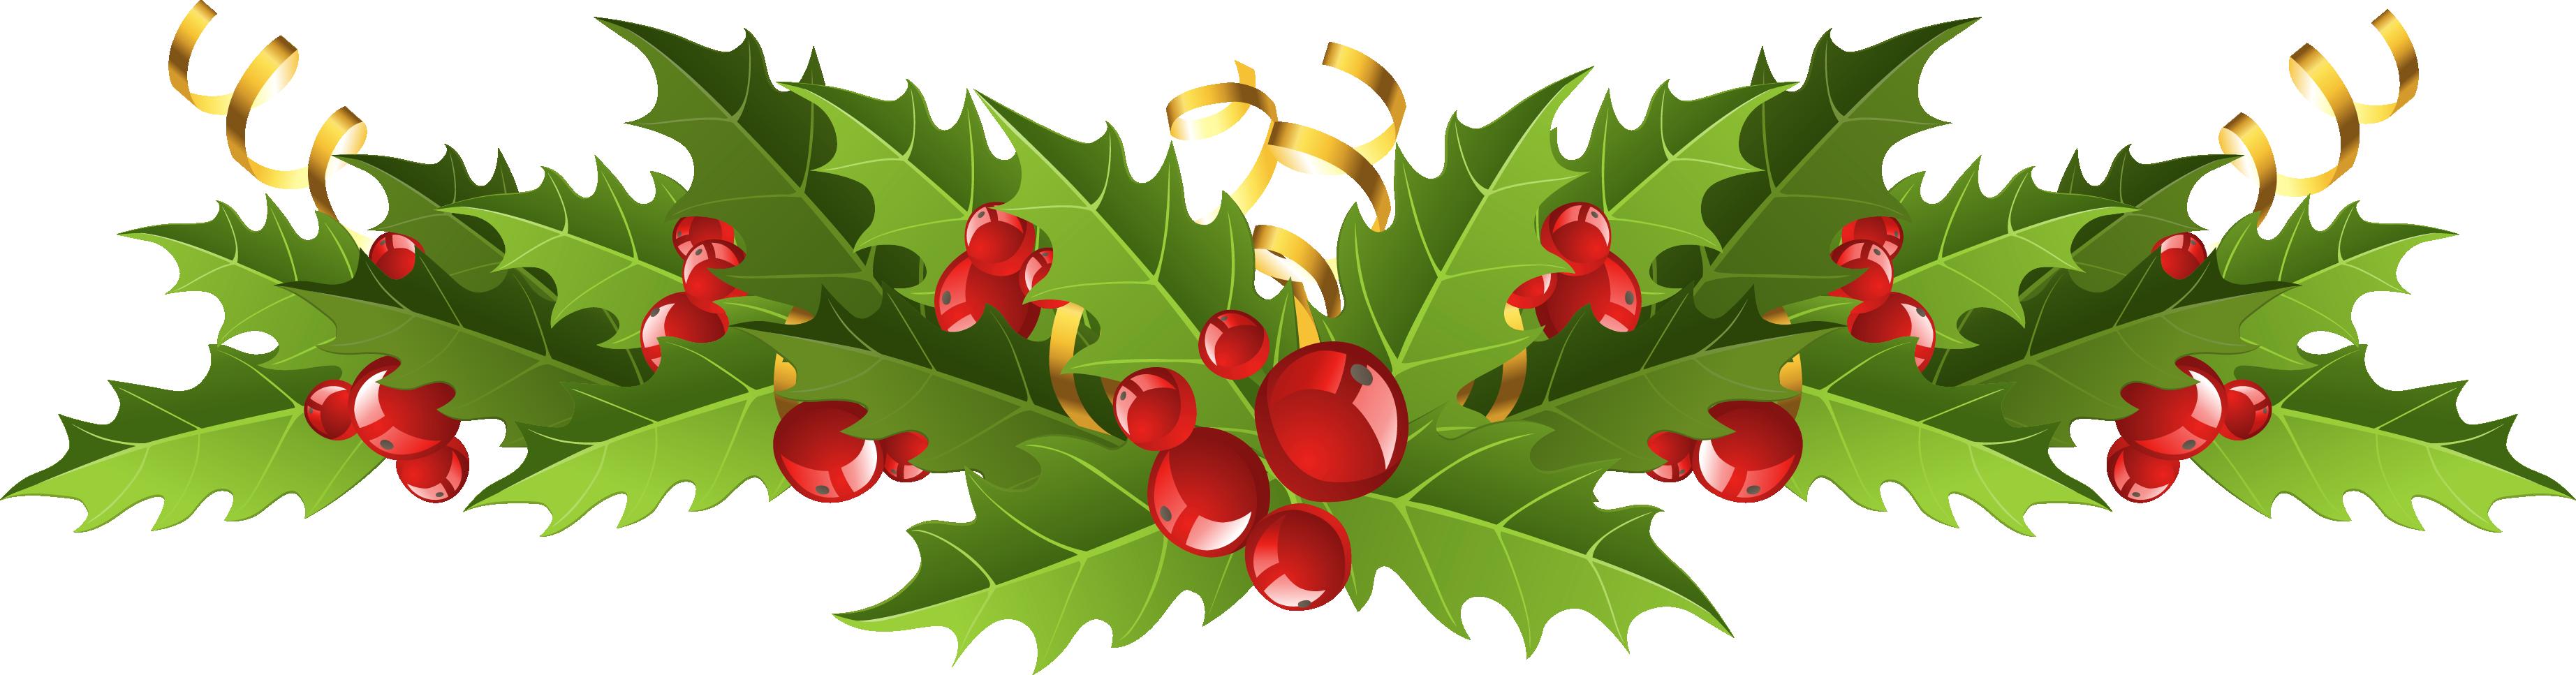 Mistletoe clipart border vector free Free Mistletoe Cliparts Transparent, Download Free Clip Art, Free ... vector free